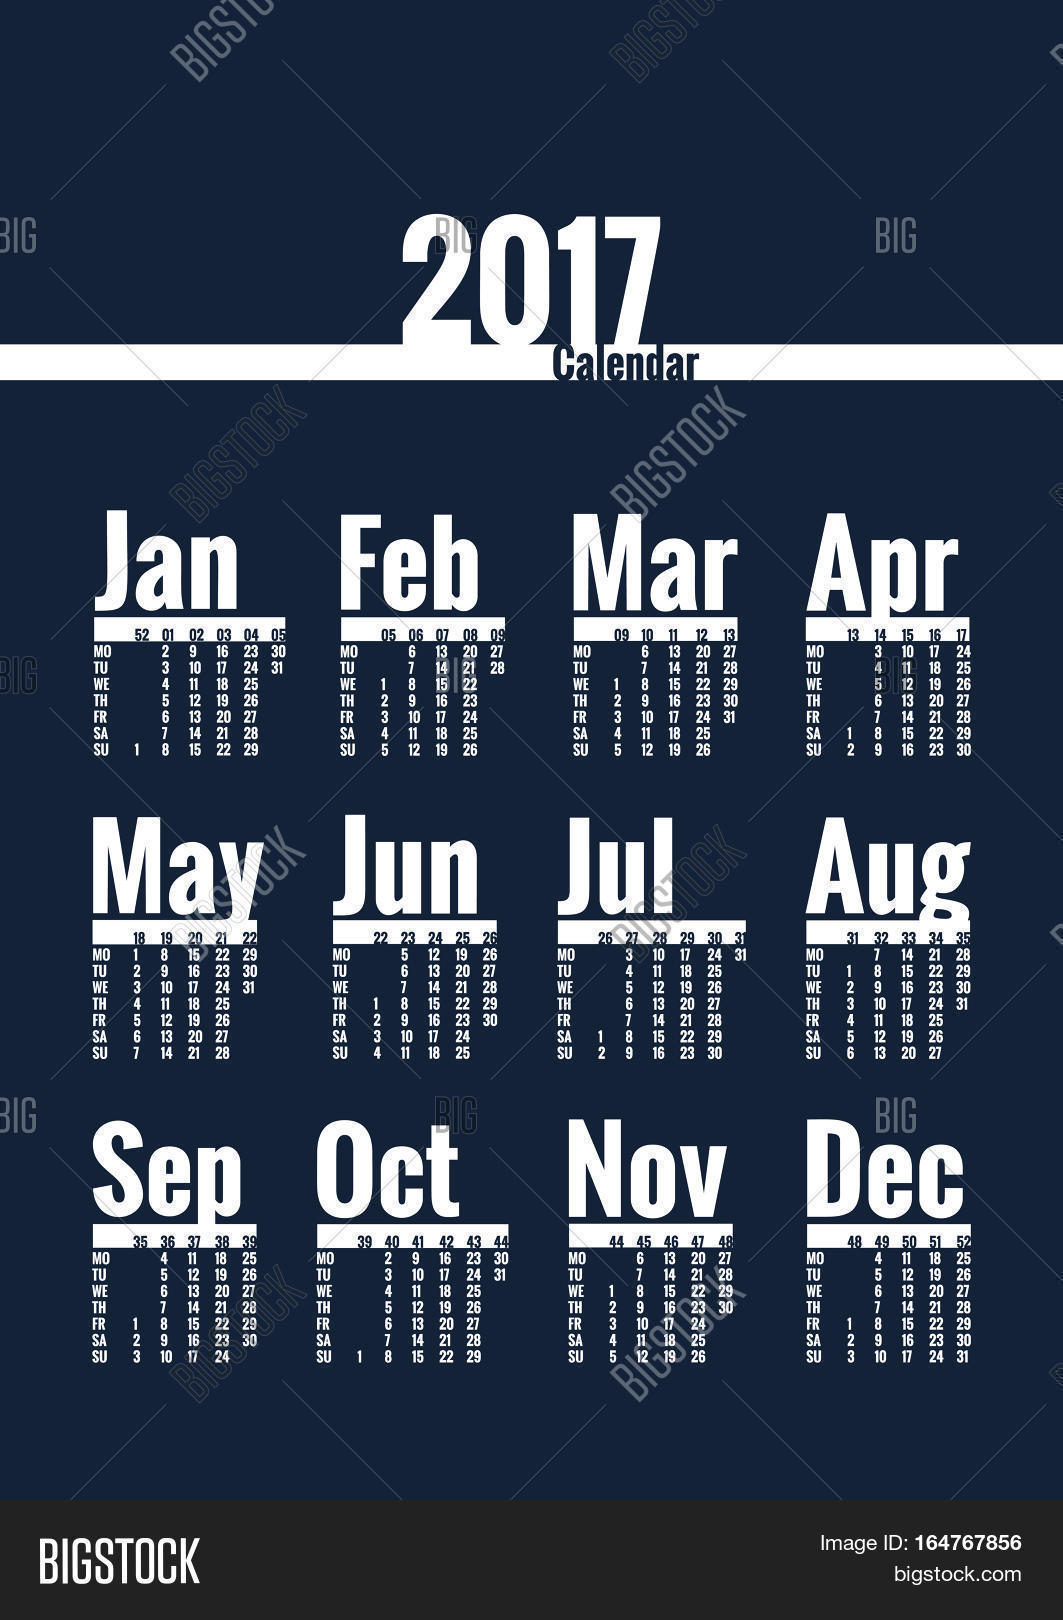 pics 2017 Poster Calendar Template bigstock